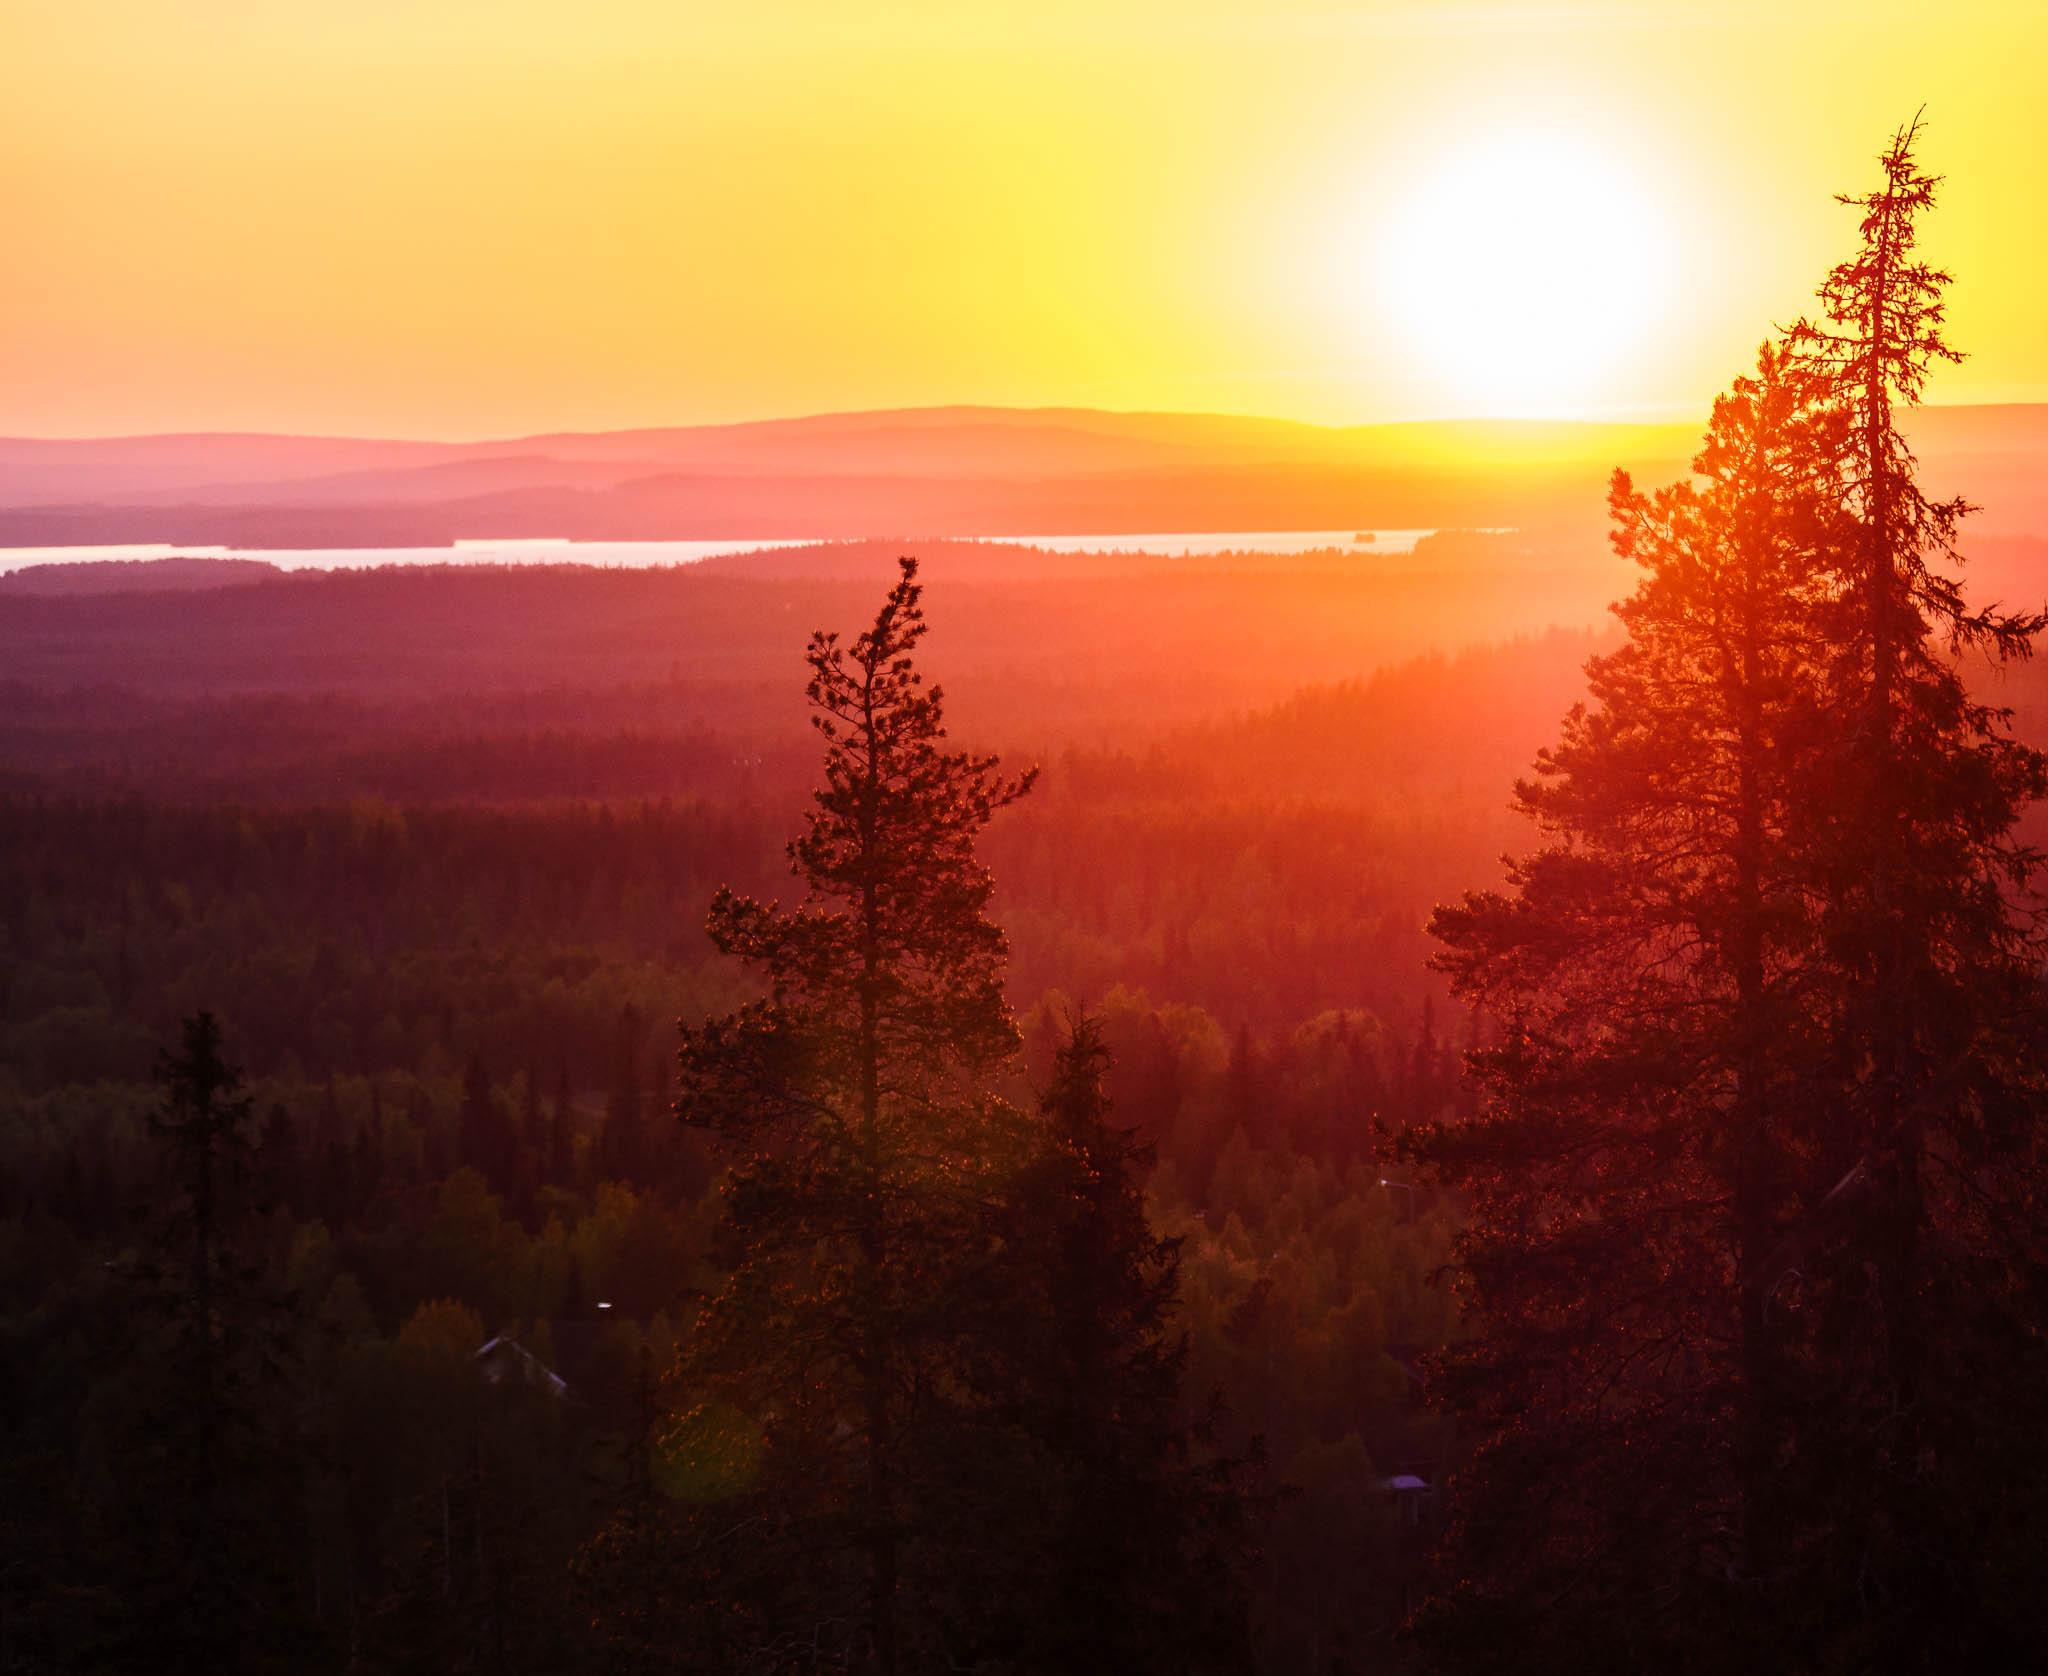 Midnight sun view in Finland